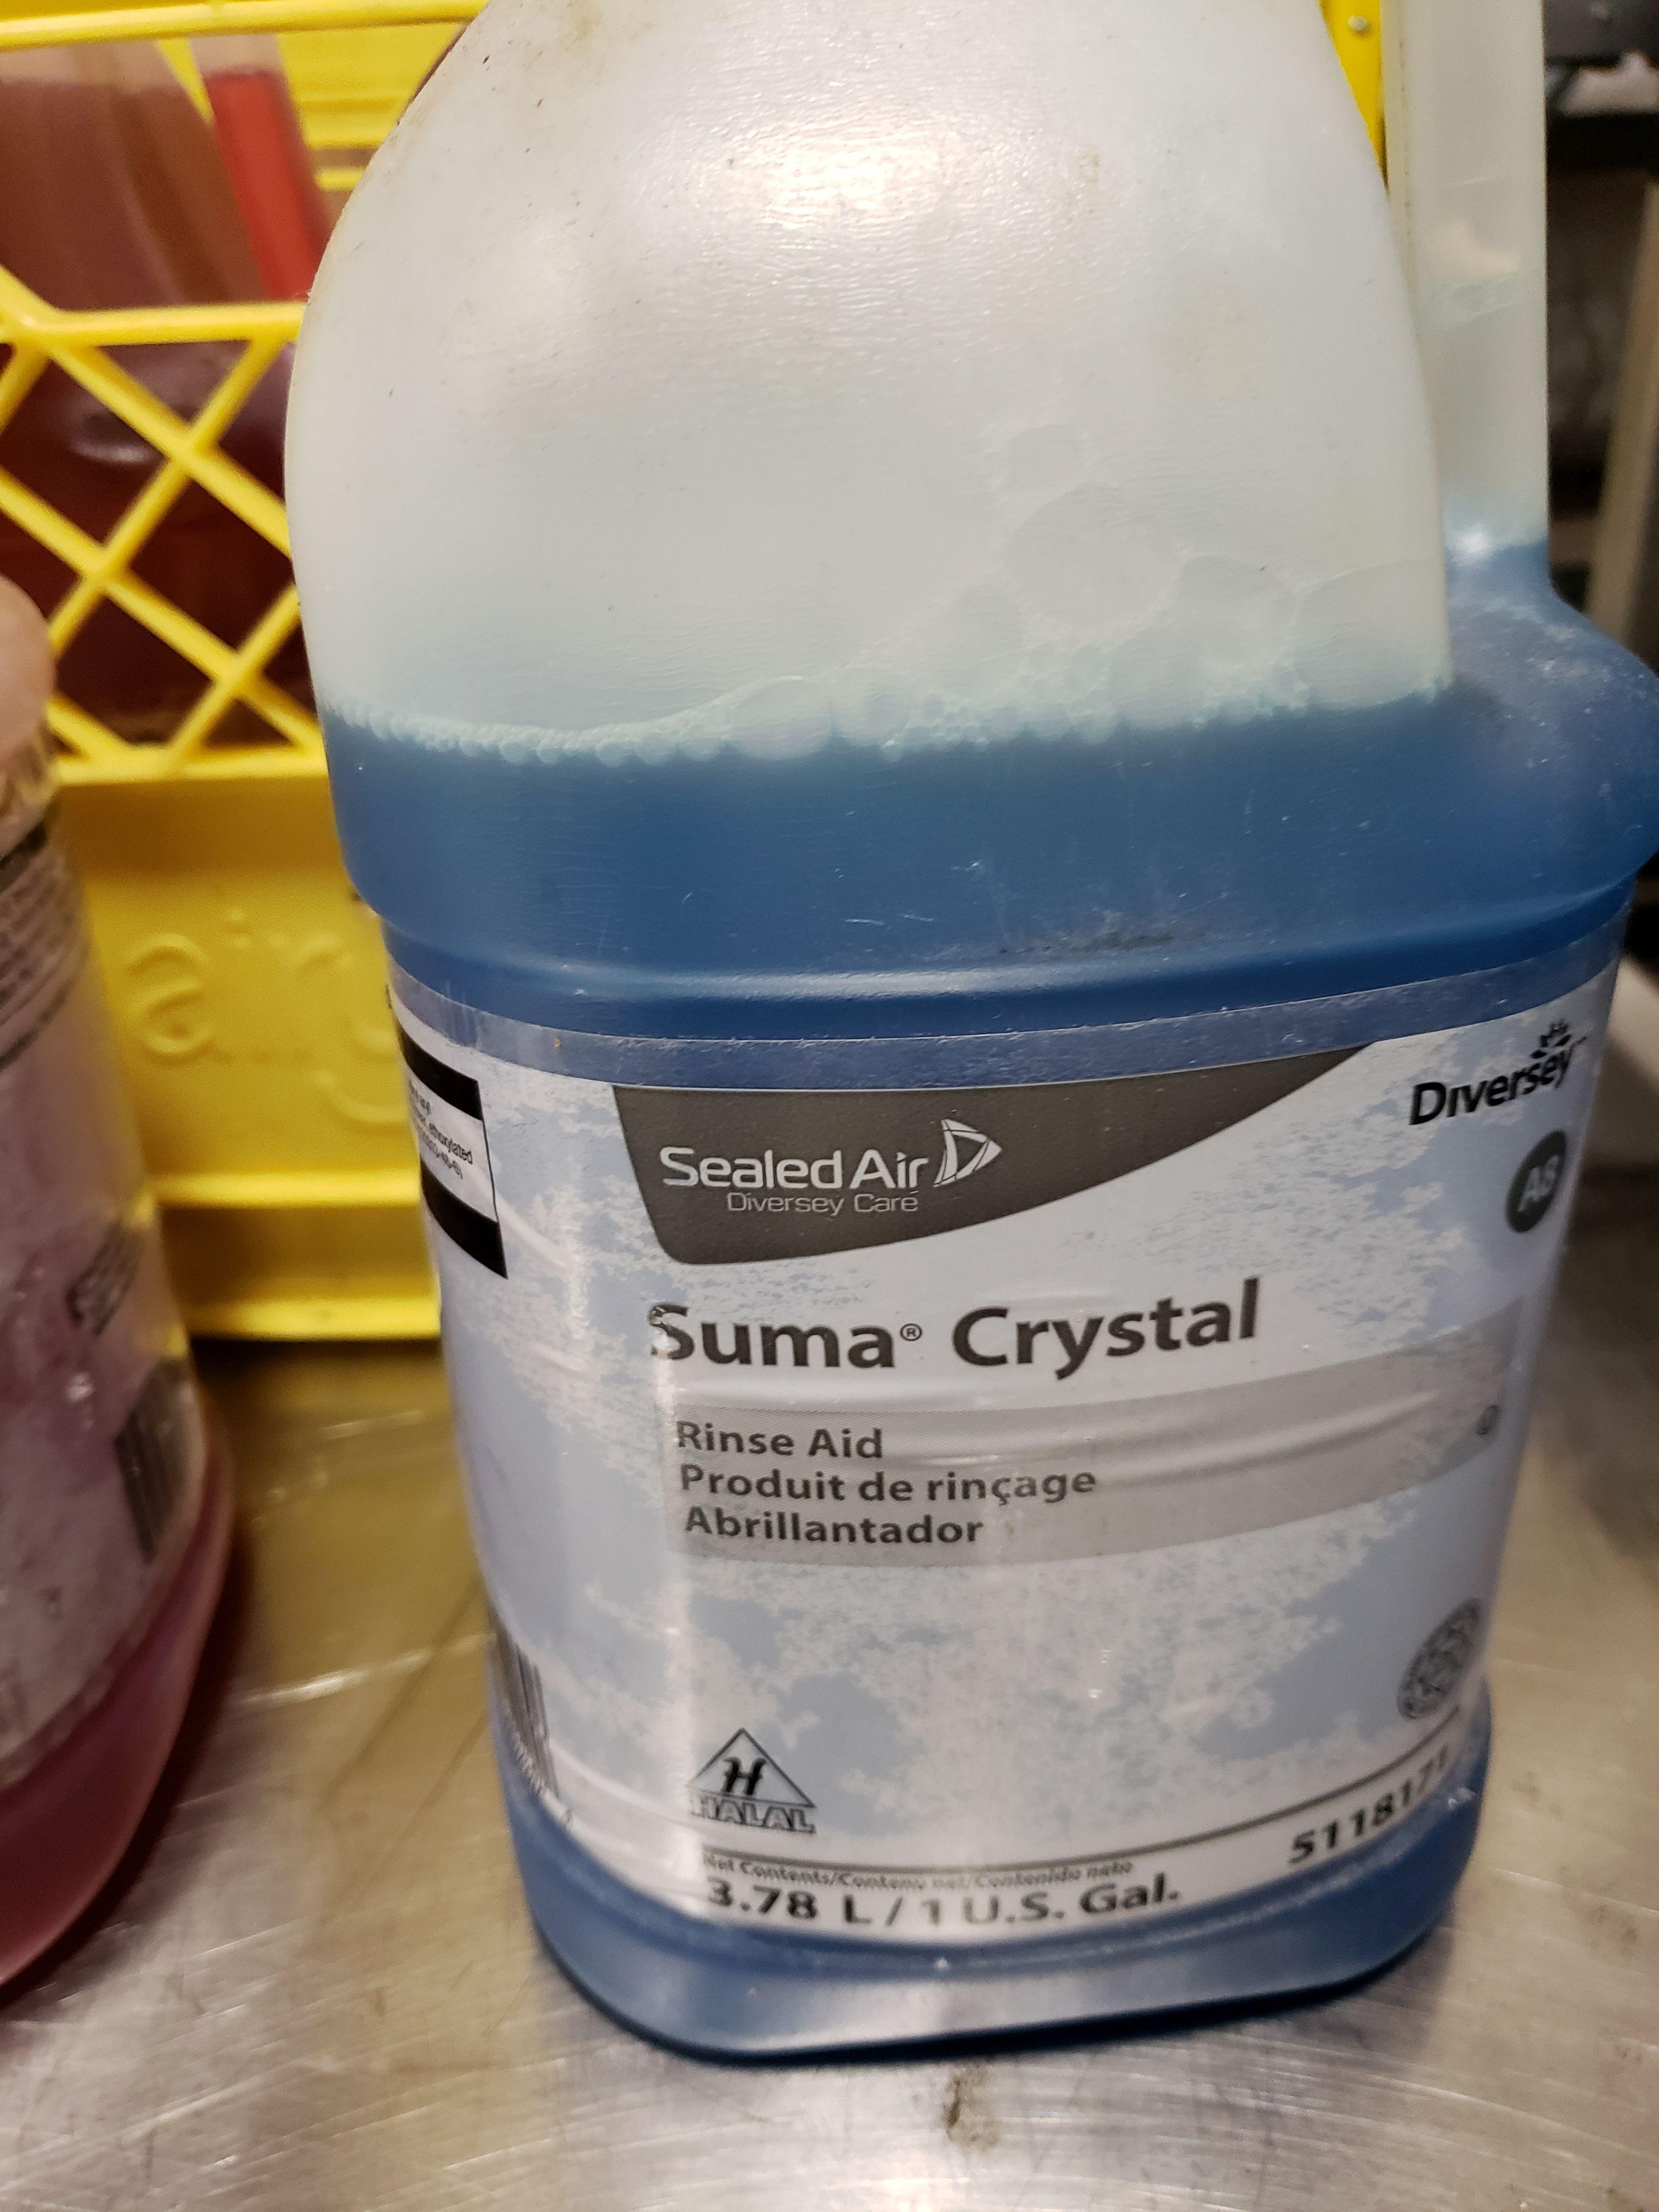 Lot 4 - Diversey Machine Dish Detergent & Suma Rinse Aid - 4 Jugs